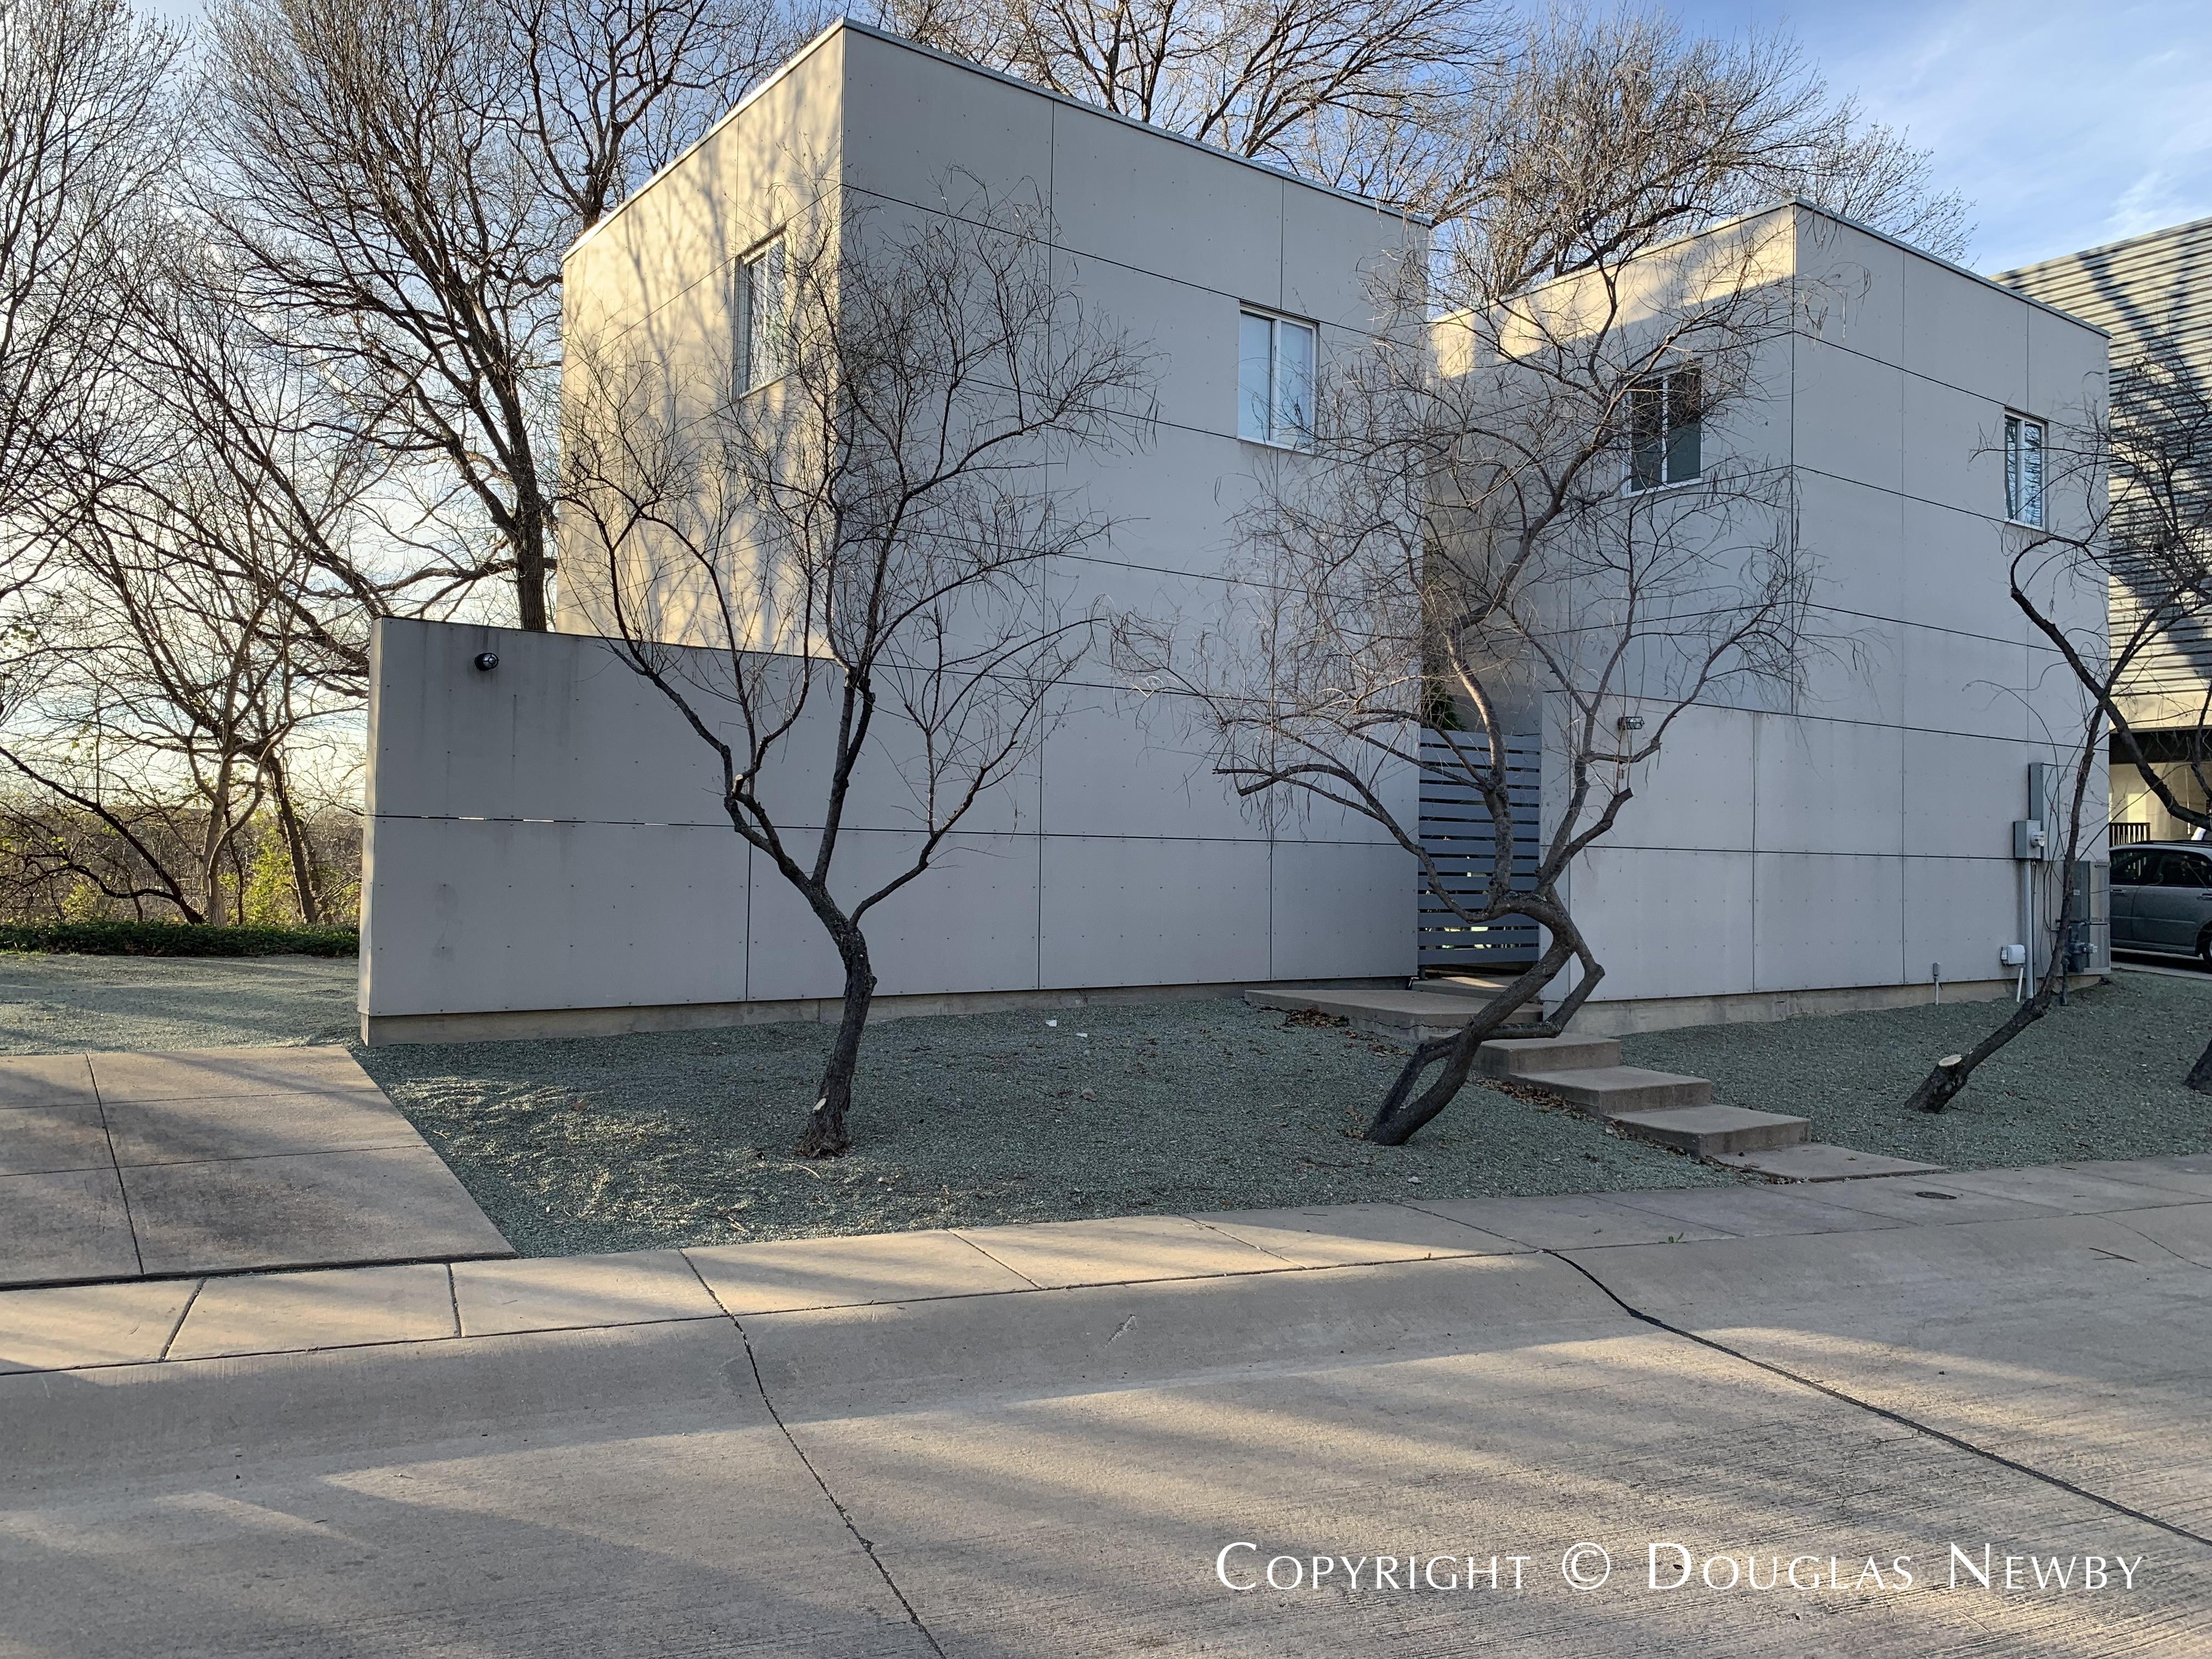 Modern Residence in Urban Reserve Neighborhood of East Dallas 11 Vanguard Way Designed by Architect Robert Meckfessel of DSGN